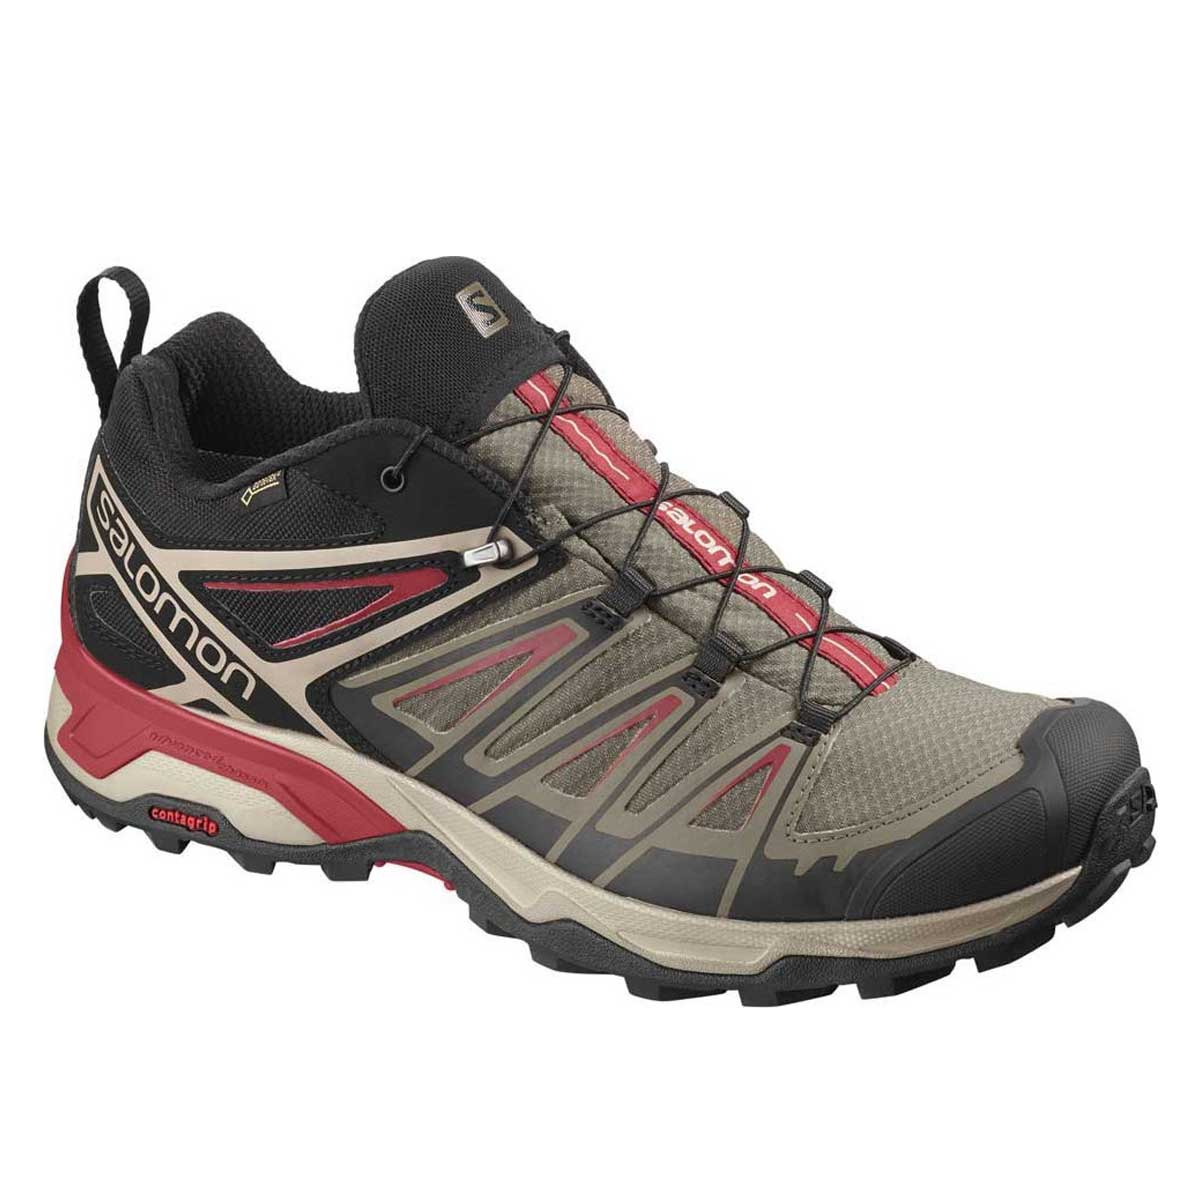 scarpa salomon recensioni